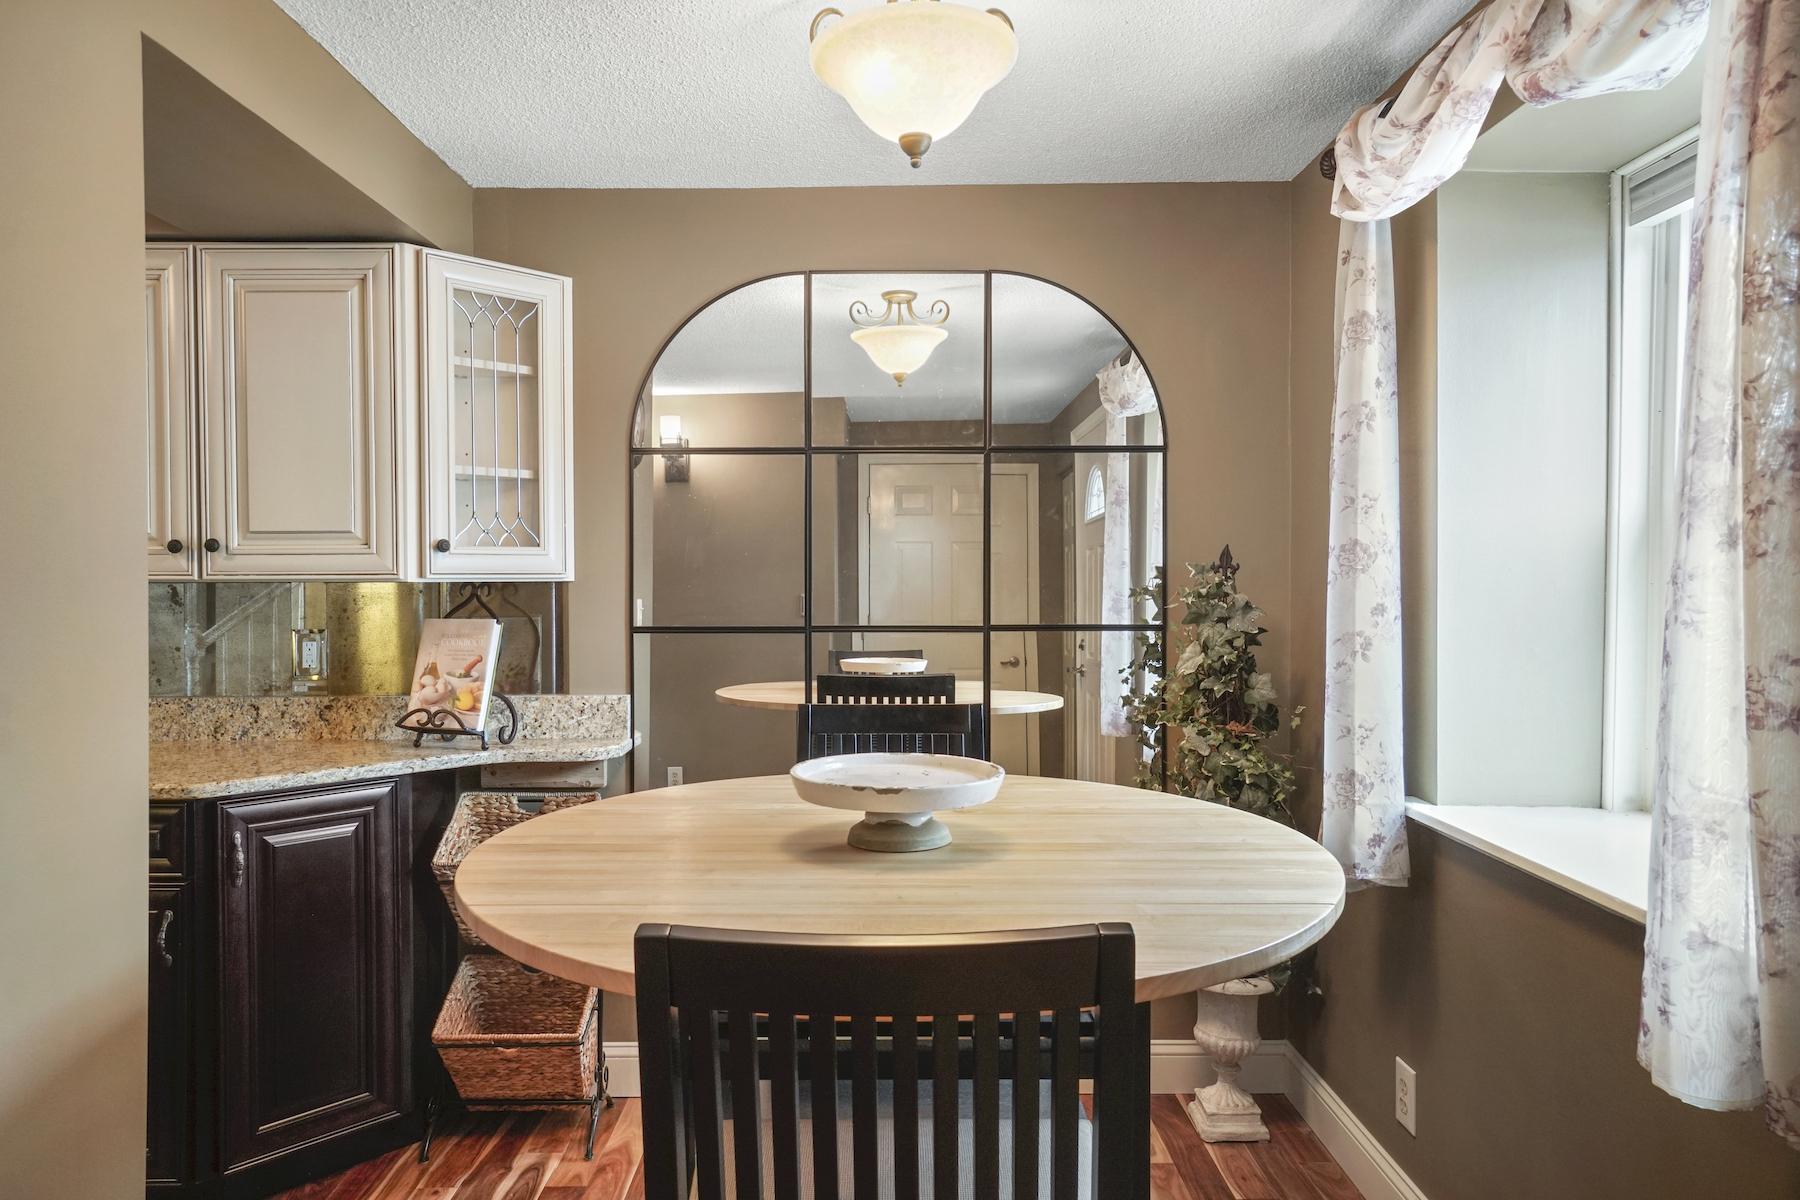 Condominiums 为 销售 在 30 Margin St - Unit G 林恩, 马萨诸塞州 01905 美国